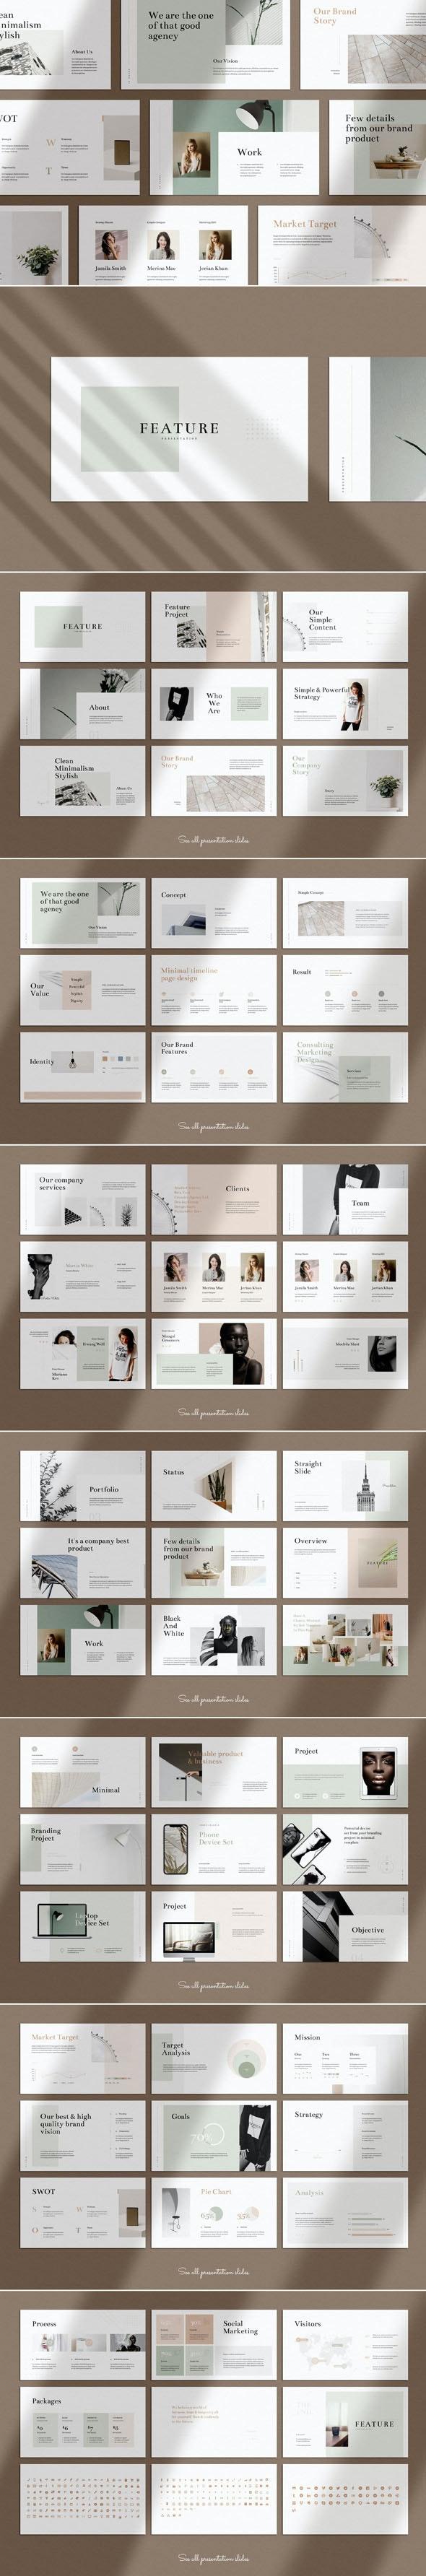 Feature Minimal Google Slides Presentation Template - Google Slides Presentation Templates